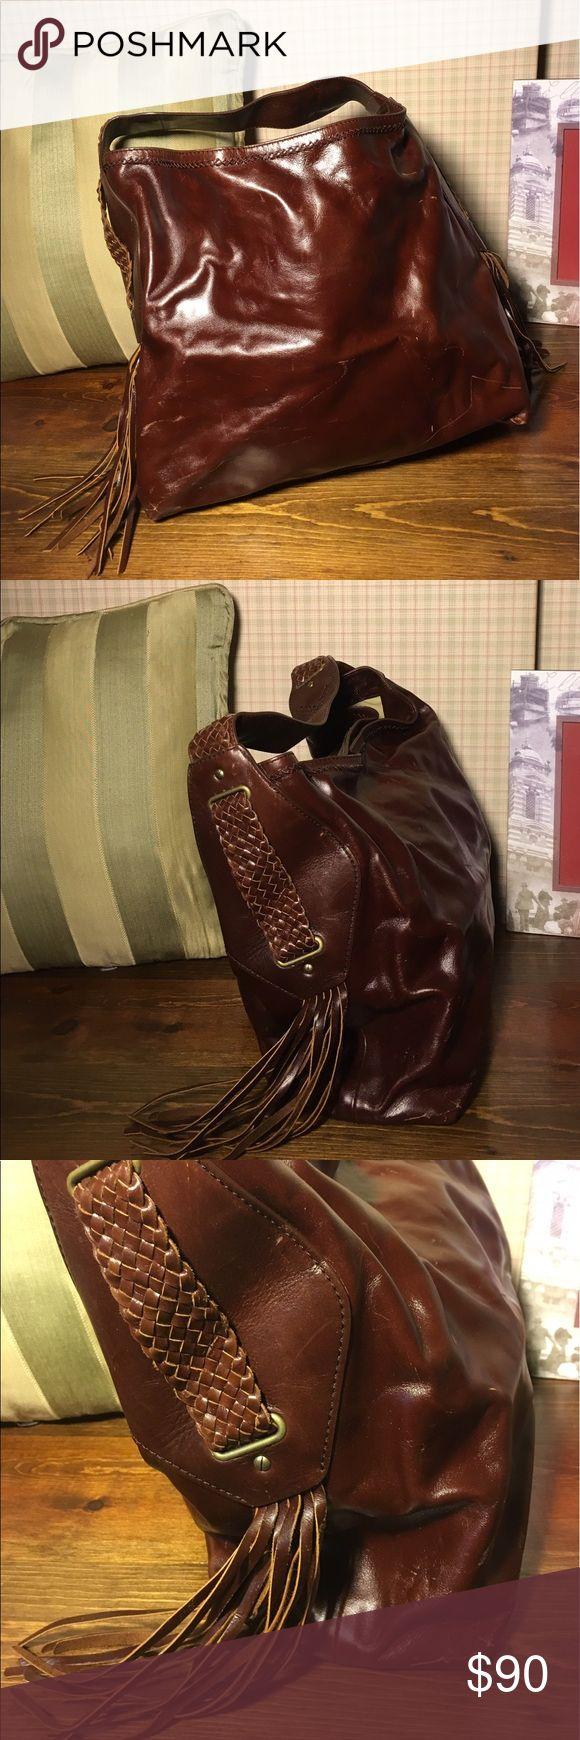 Reddish brown Cole Haan hobo shoulder bag Cole Haan leather fringe hobo shoulder bag. Cole Haan Bags Hobos